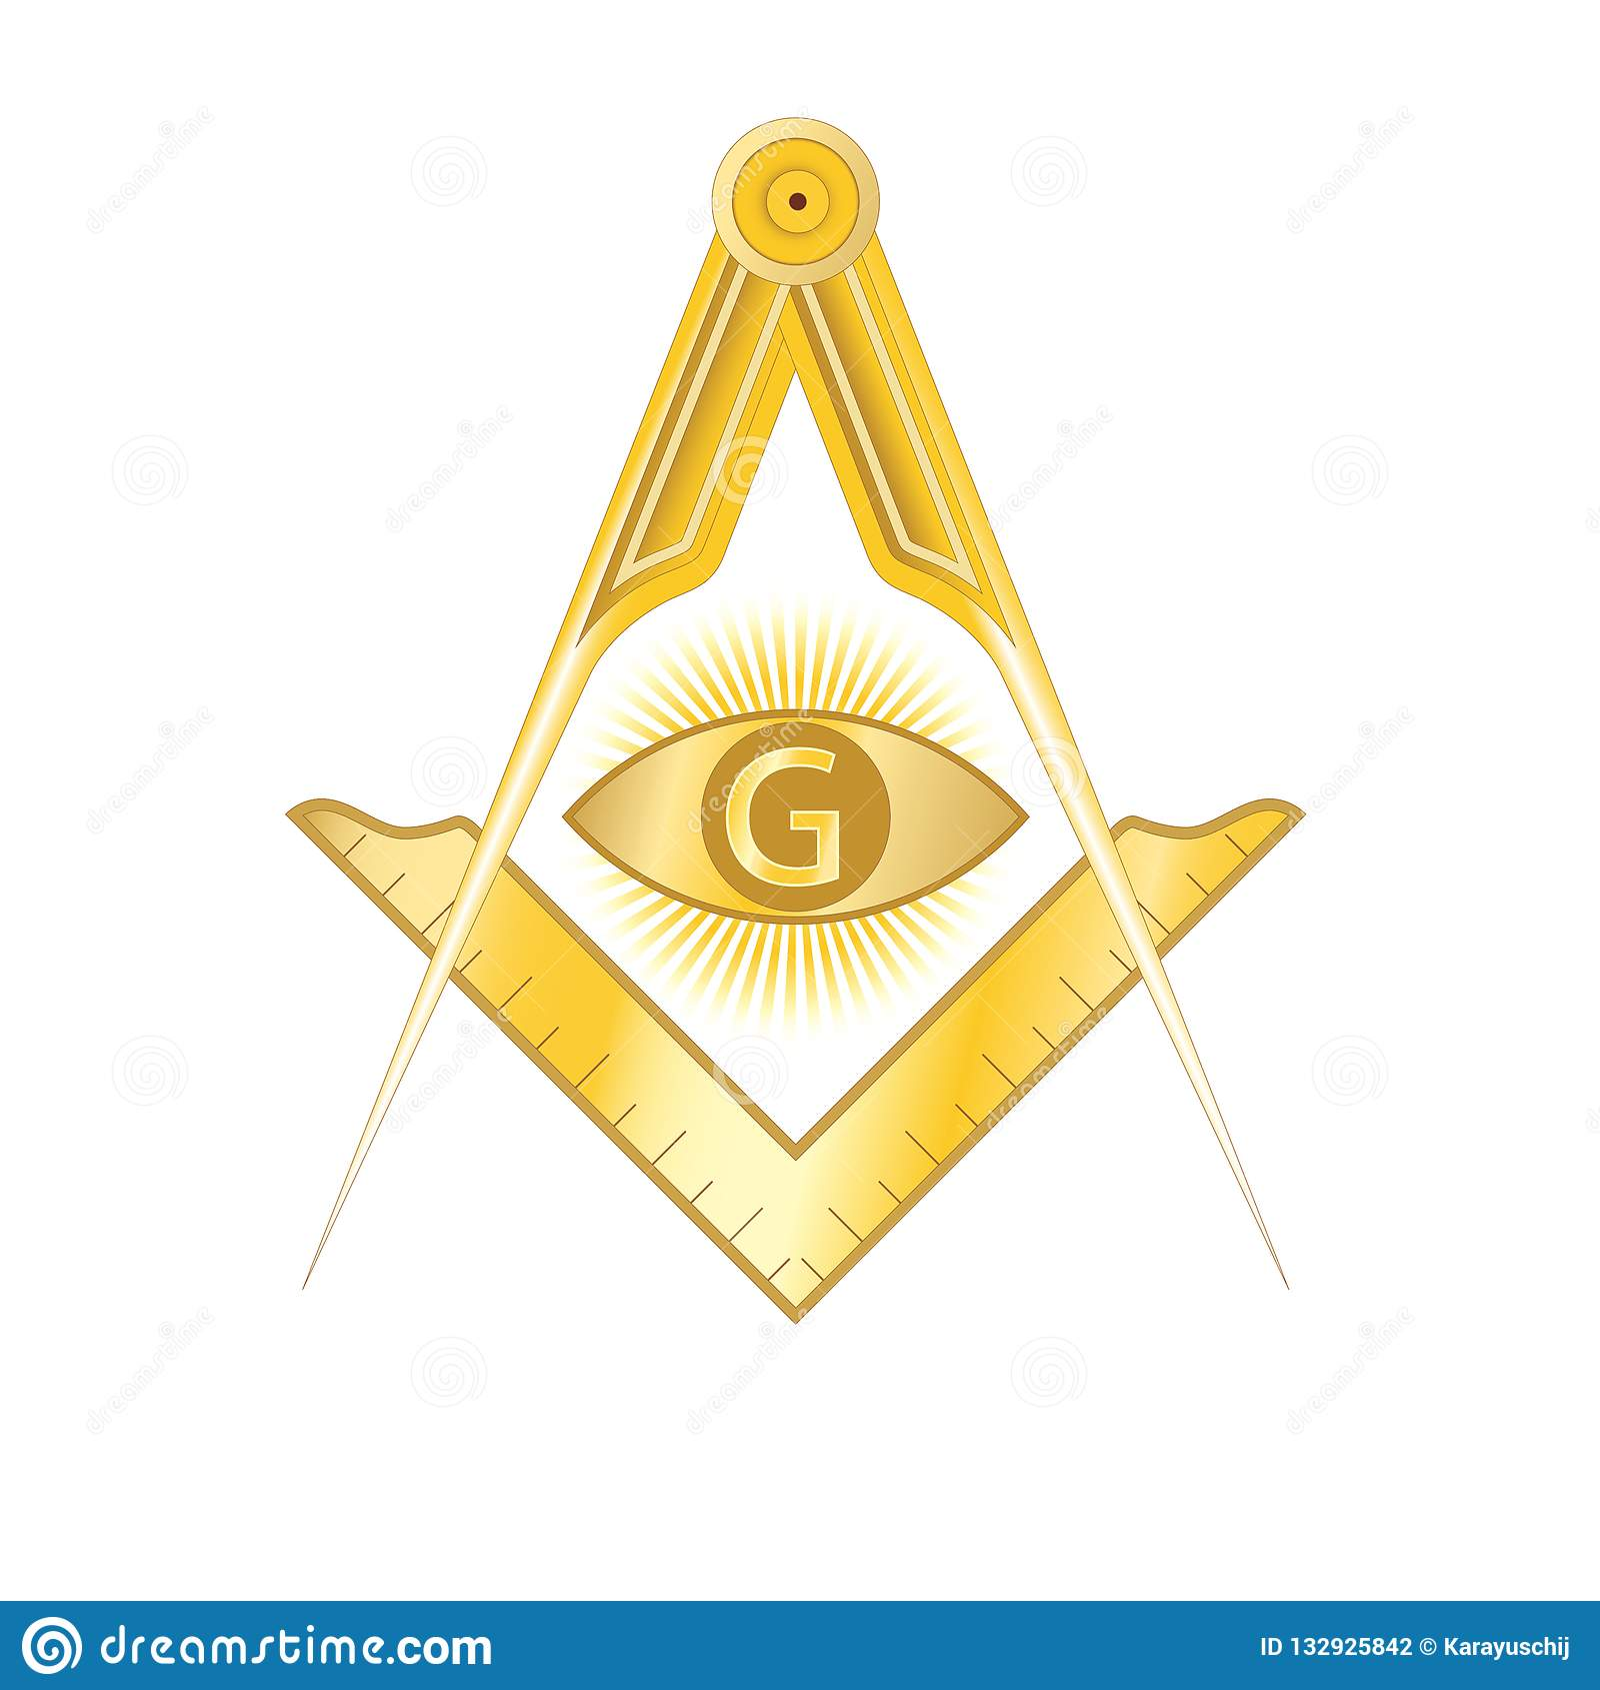 Golden Masonic Square And Compass Symbol Stock Vector